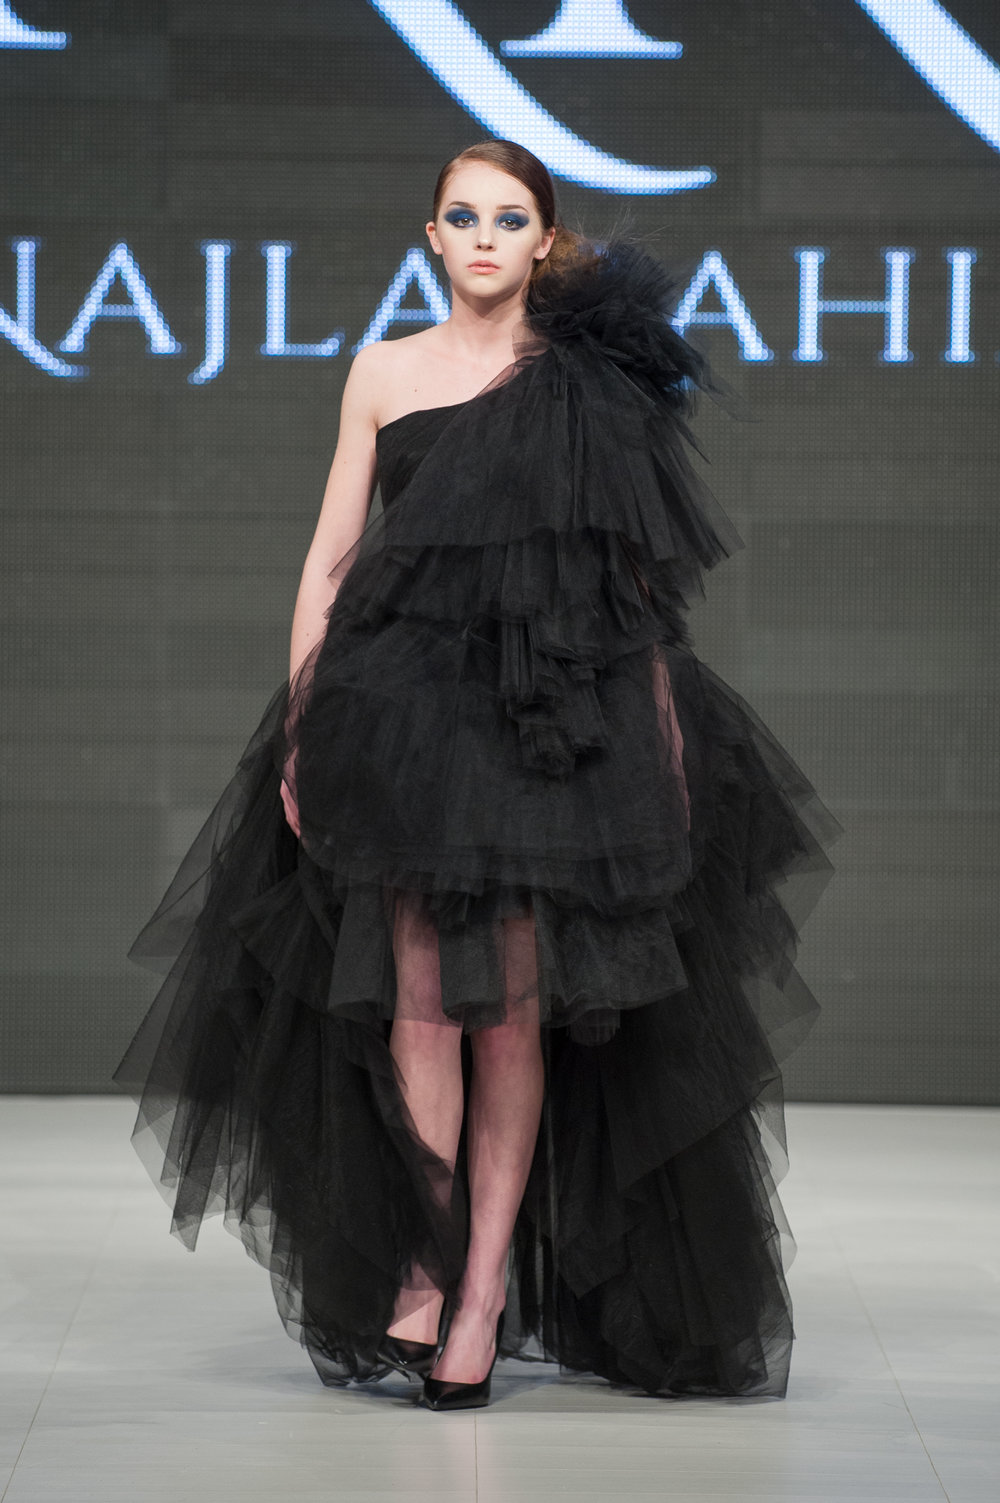 FAT2018-Day1-April17-Najla_Rahimi-Runway-Che_Rosales-LARAWAN-5709.jpg